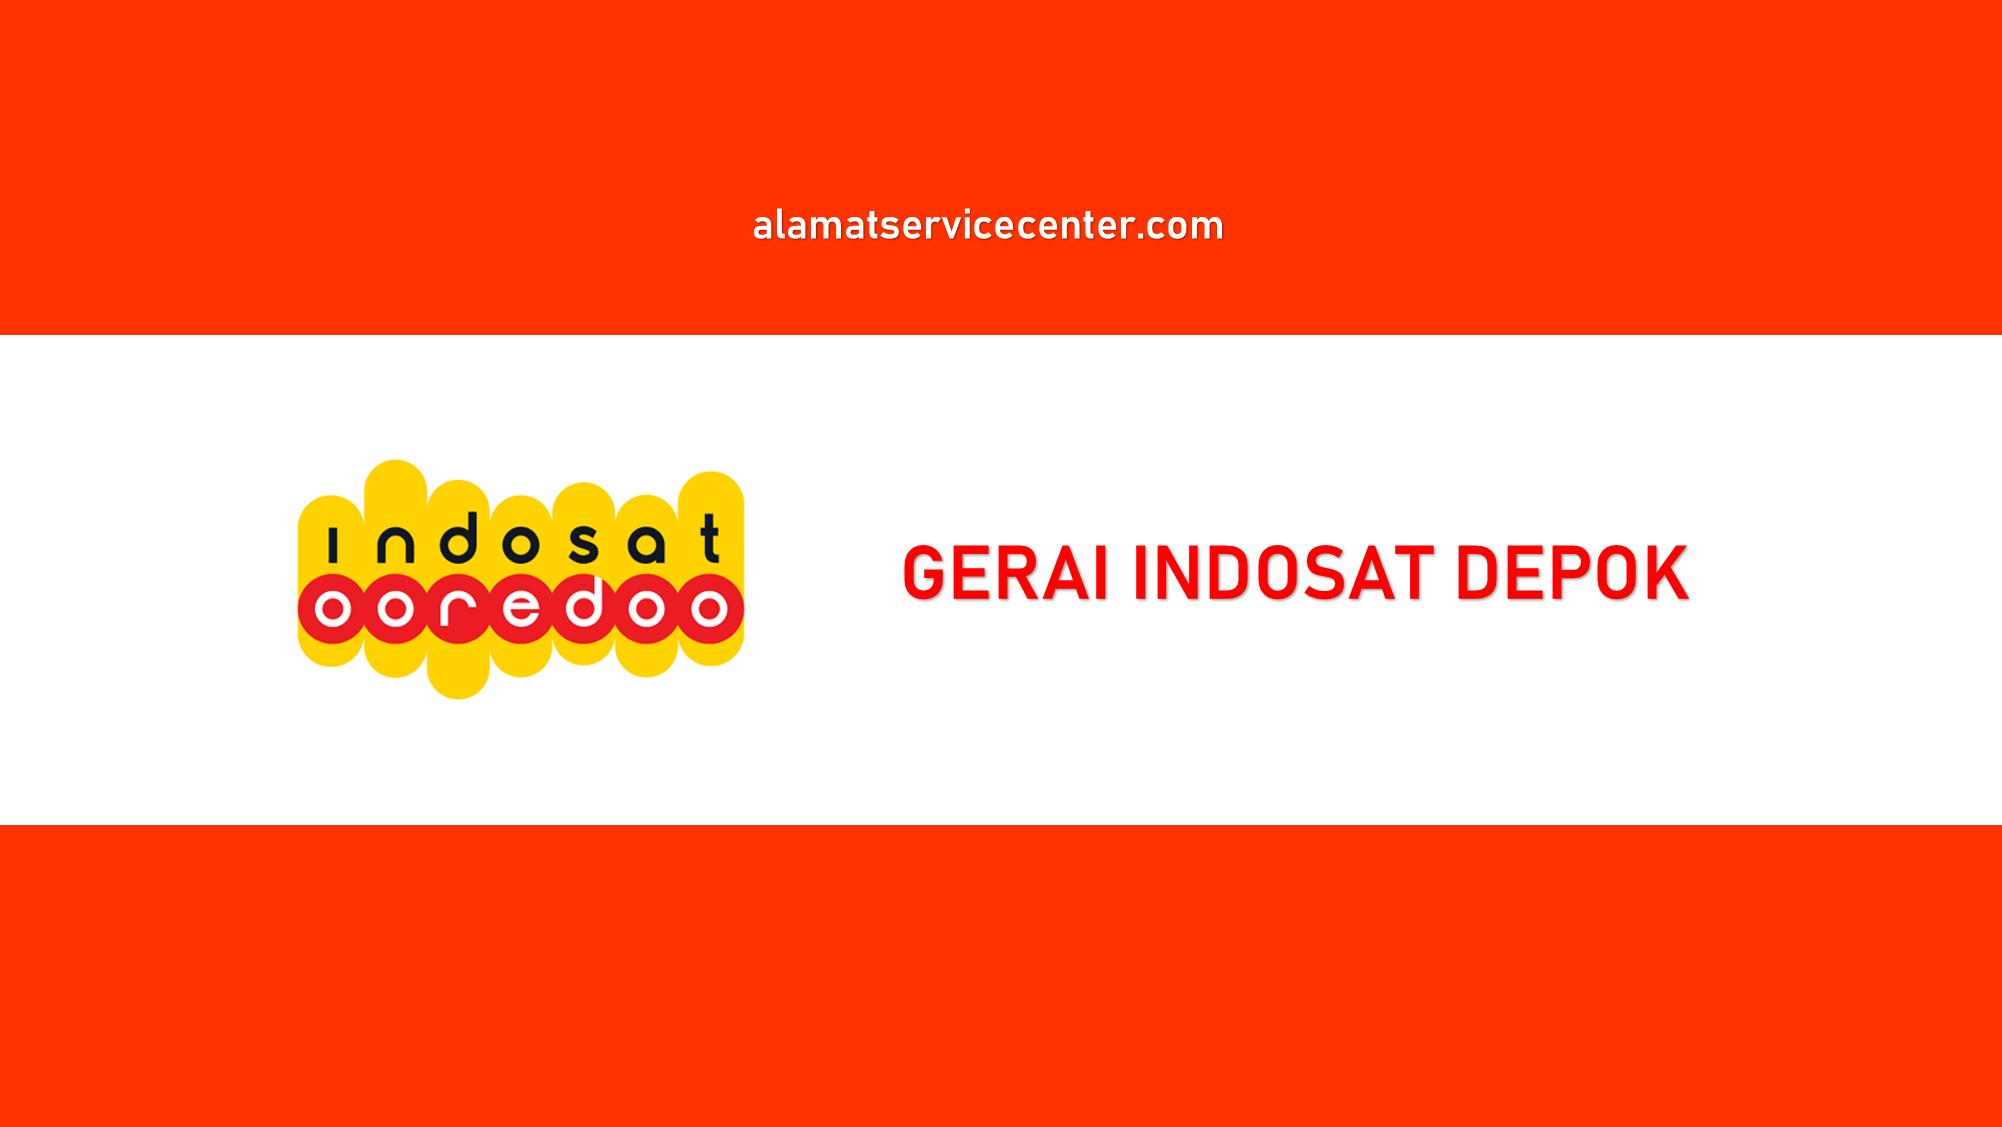 Gerai Indosat Depok